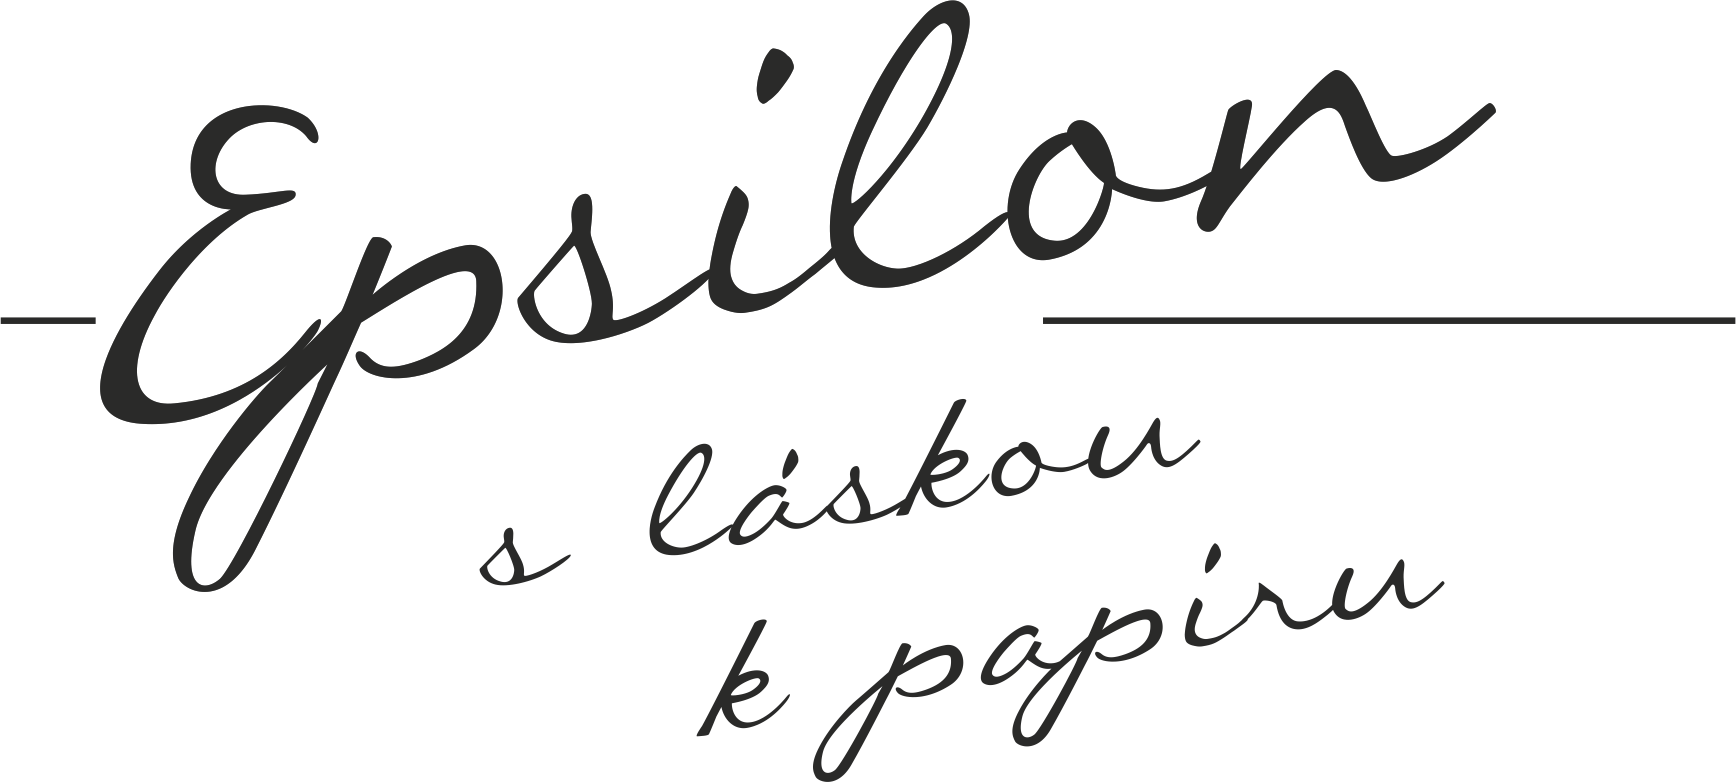 Vzorkovna - Epsilon